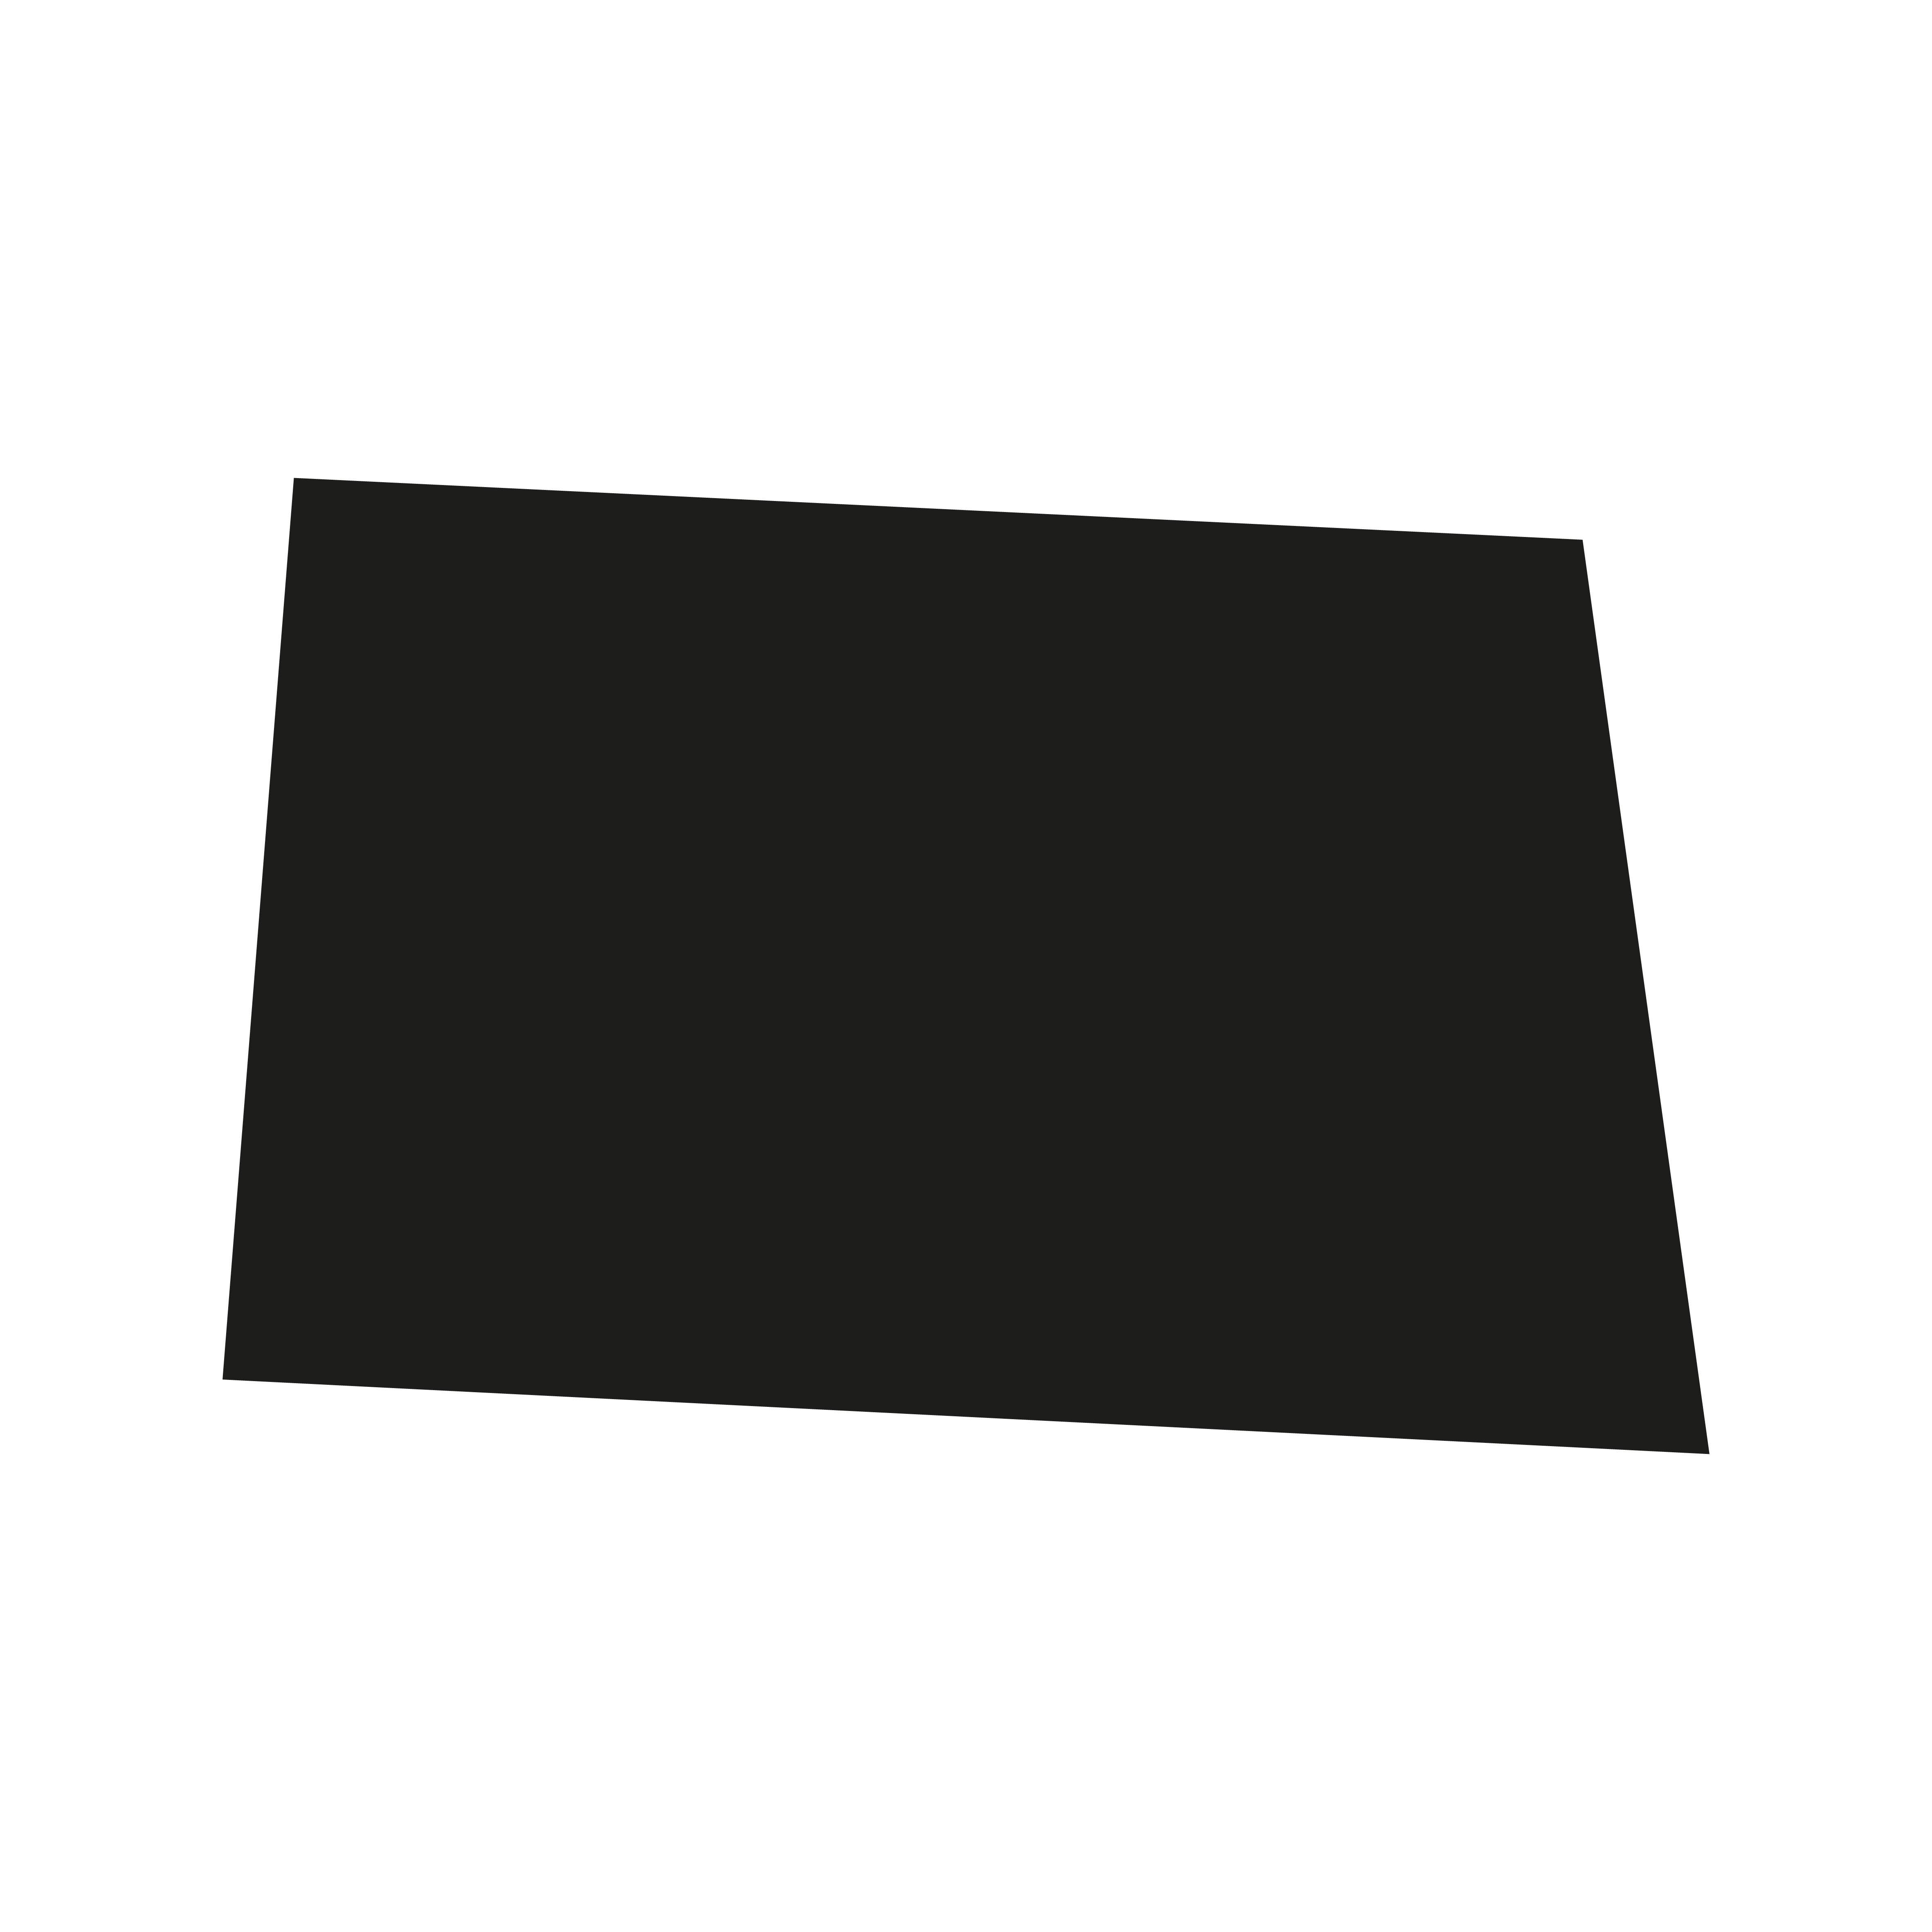 North Dakota, America, North, Vector, Usa, HQ Photo